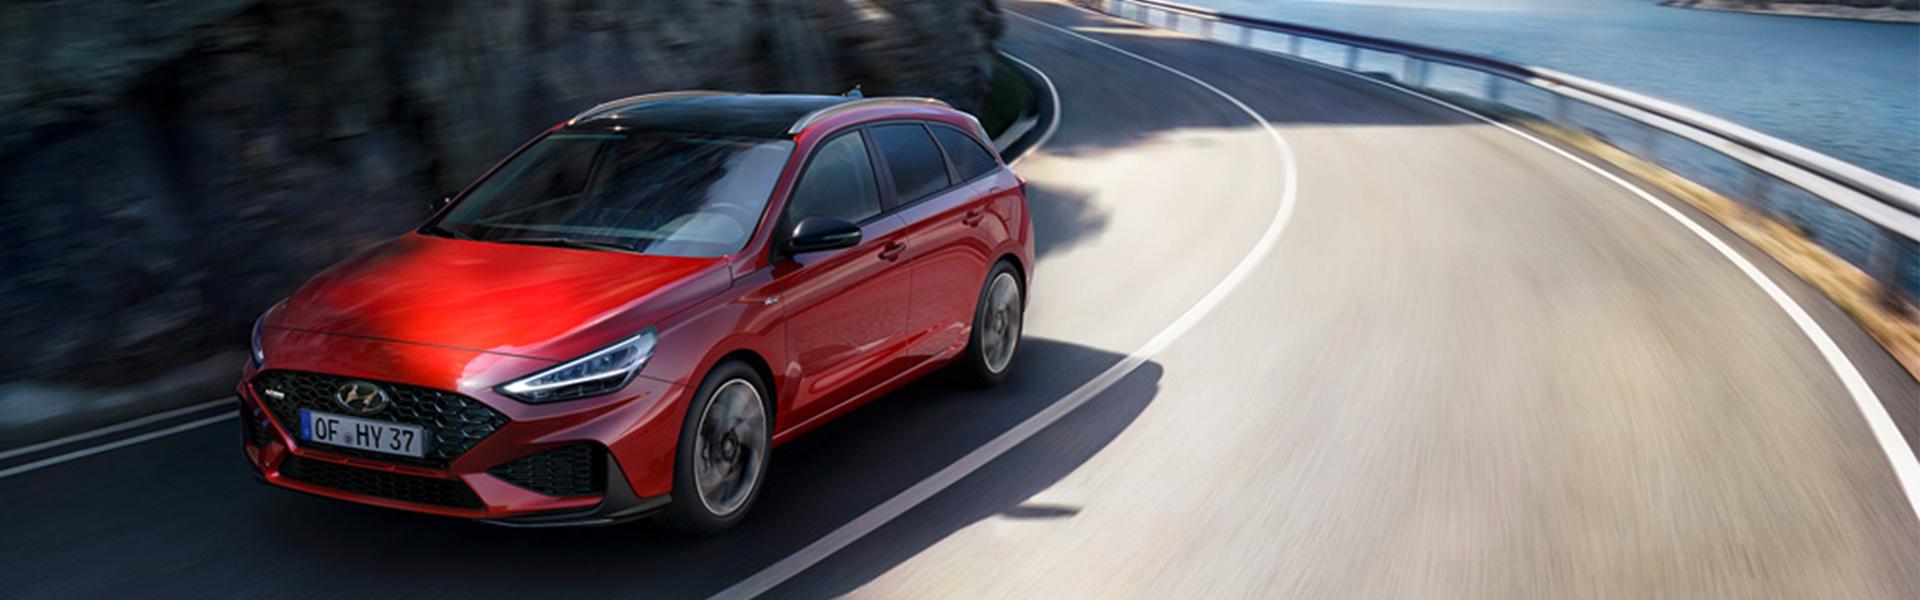 Hyundai i30 Hatchback - обзор